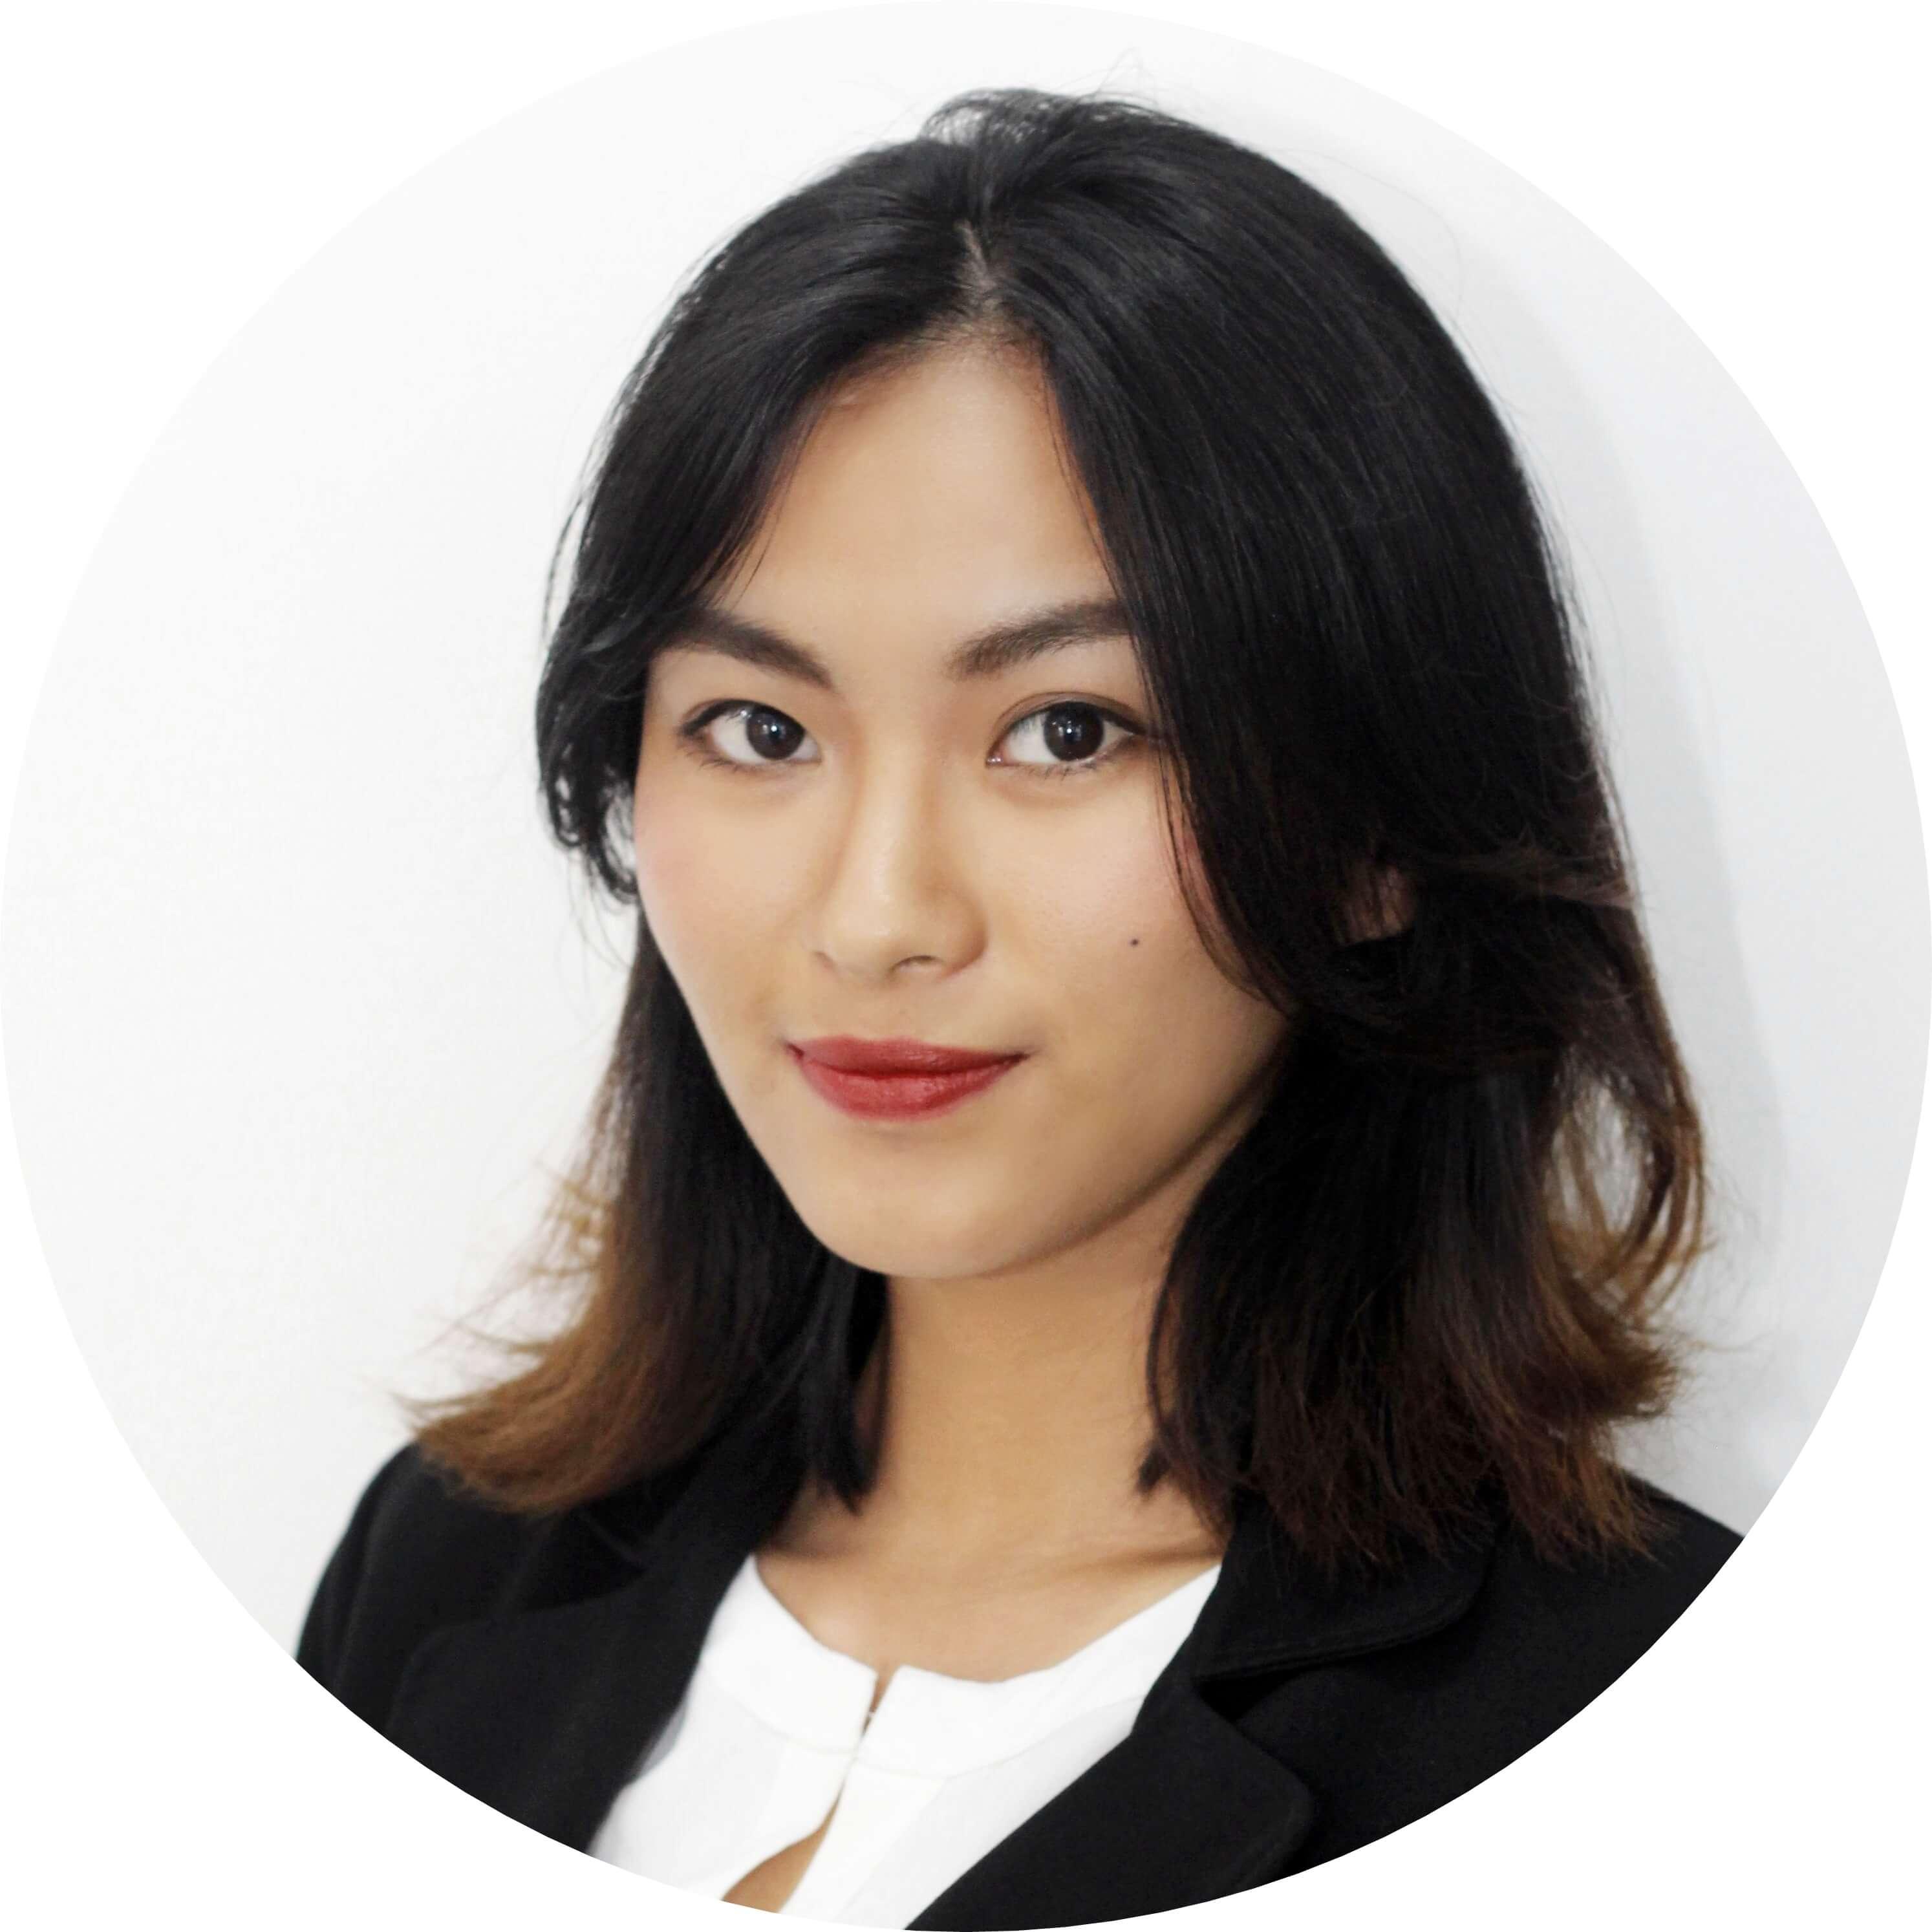 Nguyen Lam Quynh